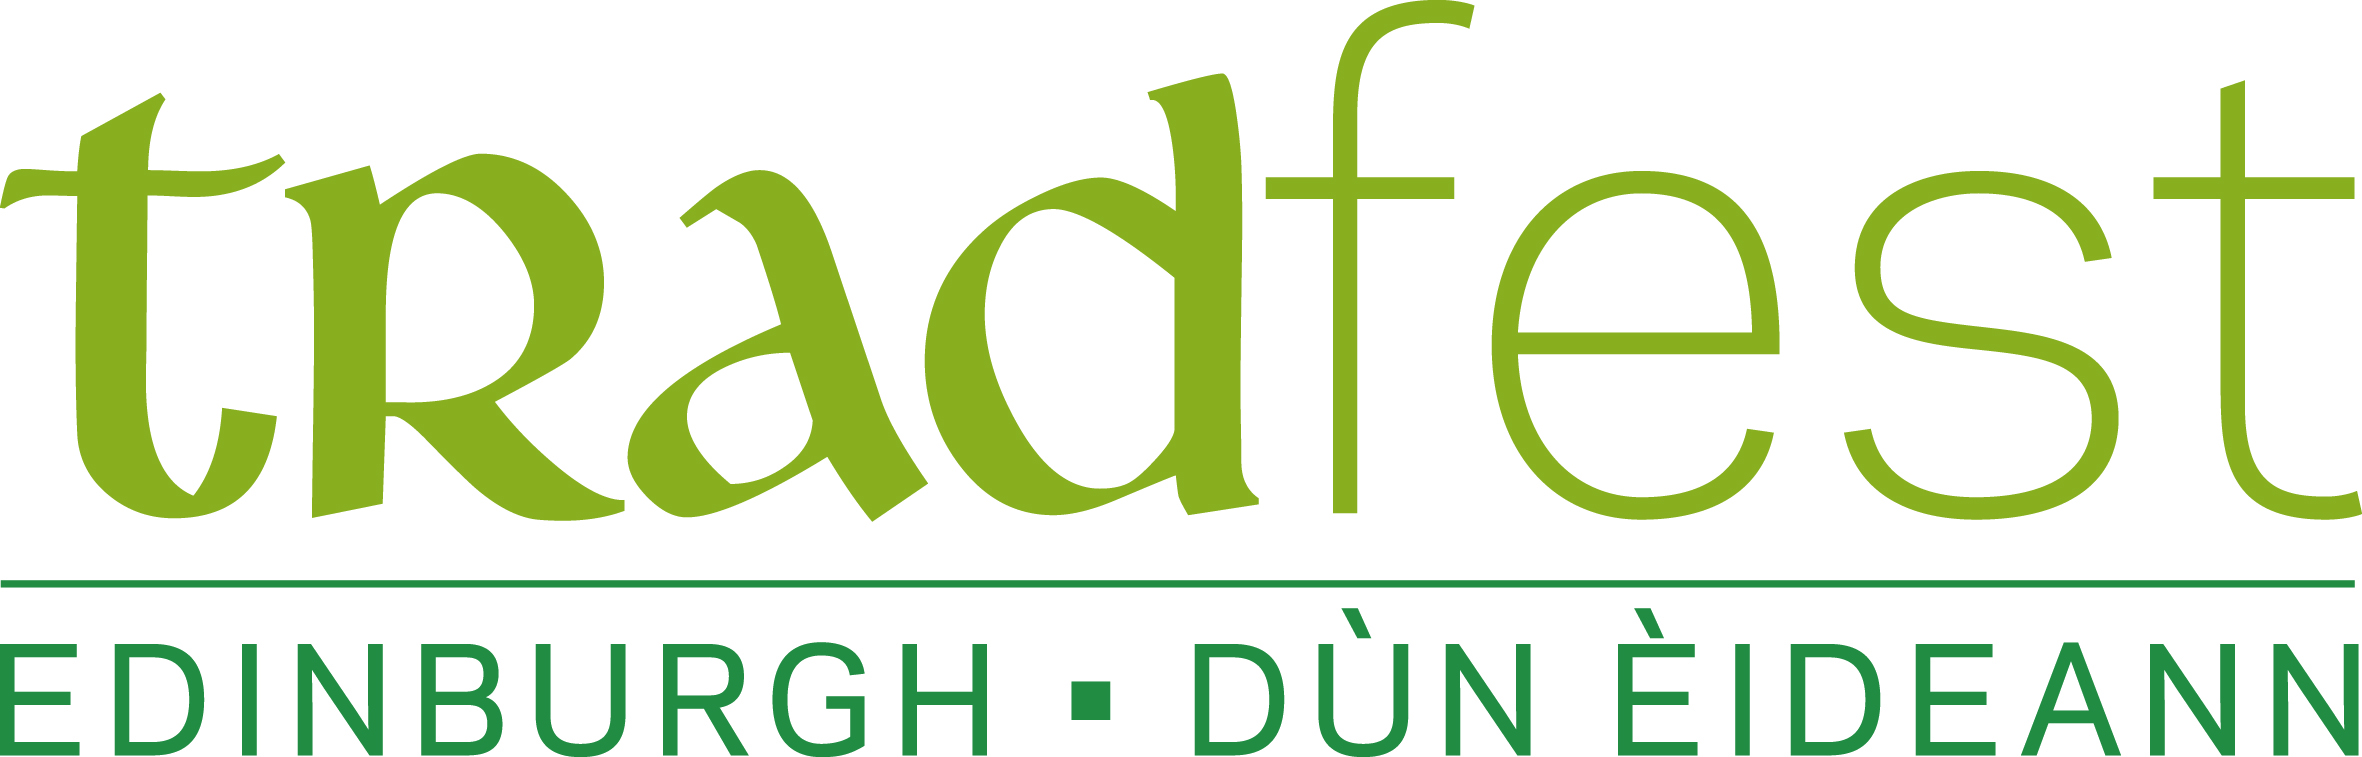 Tradfest logo